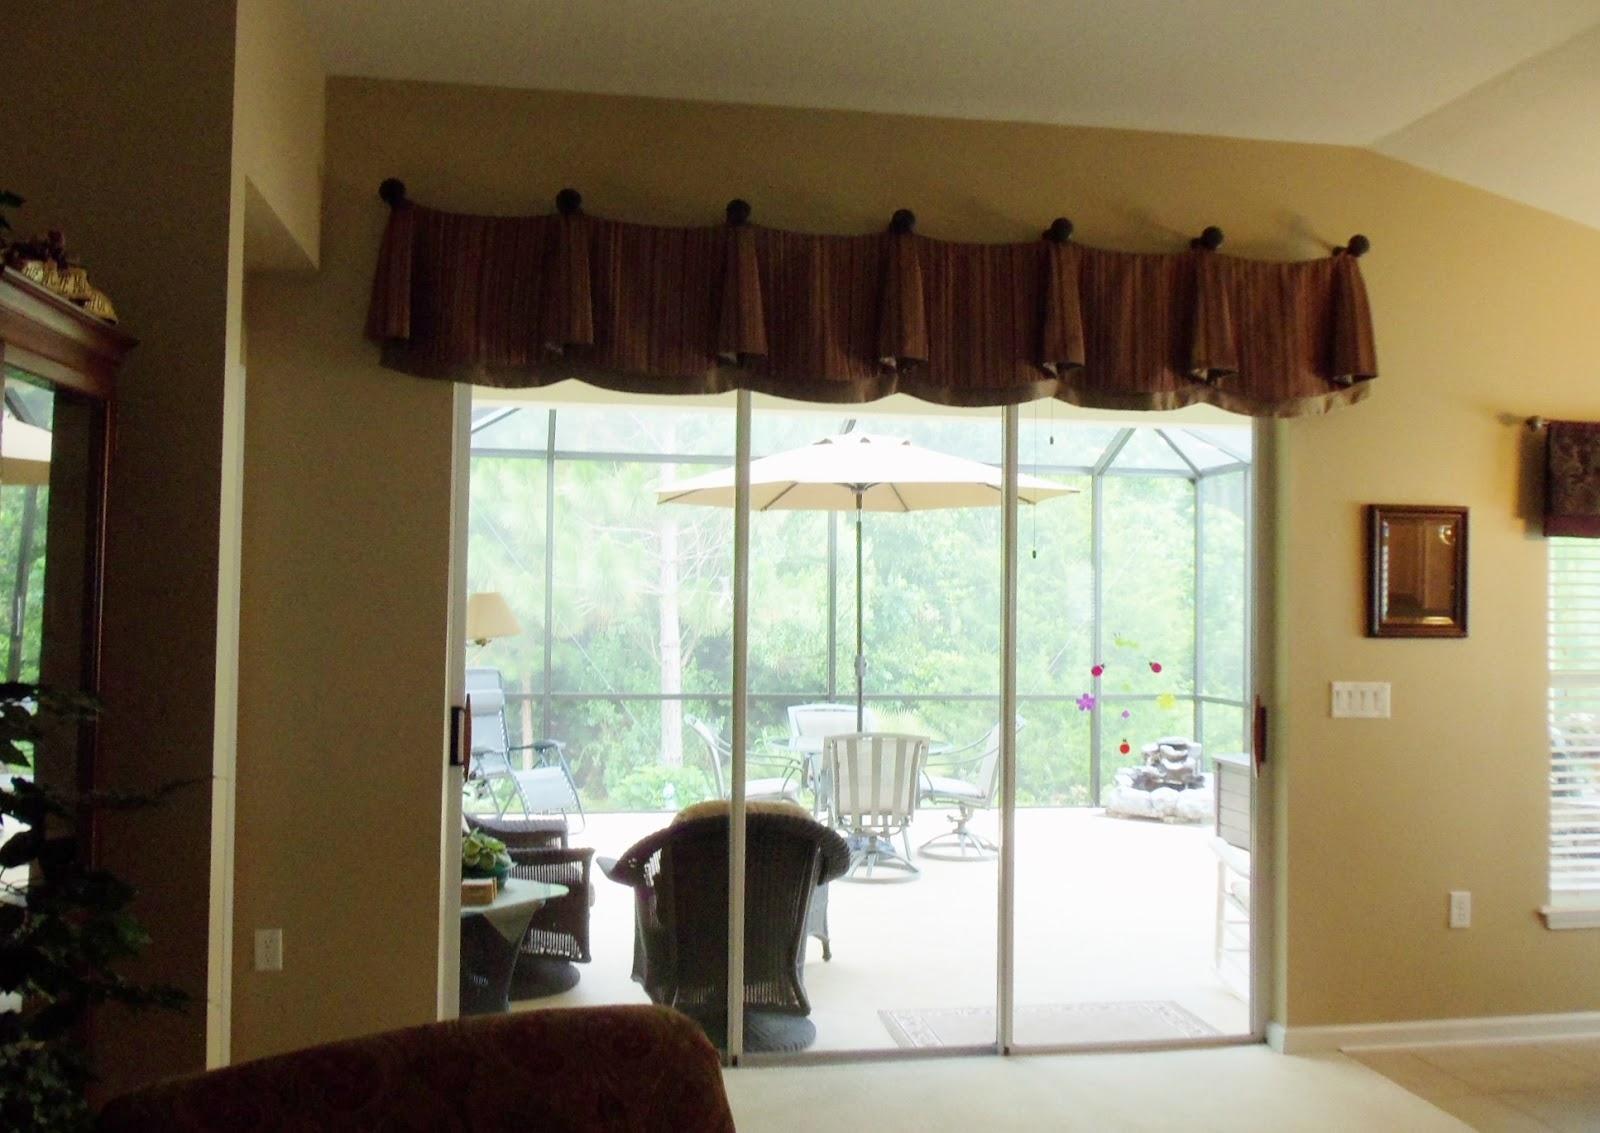 Window Coverings Ideas For Sliding Glass Doorskitchen appealing cool elegant sliding glass door window